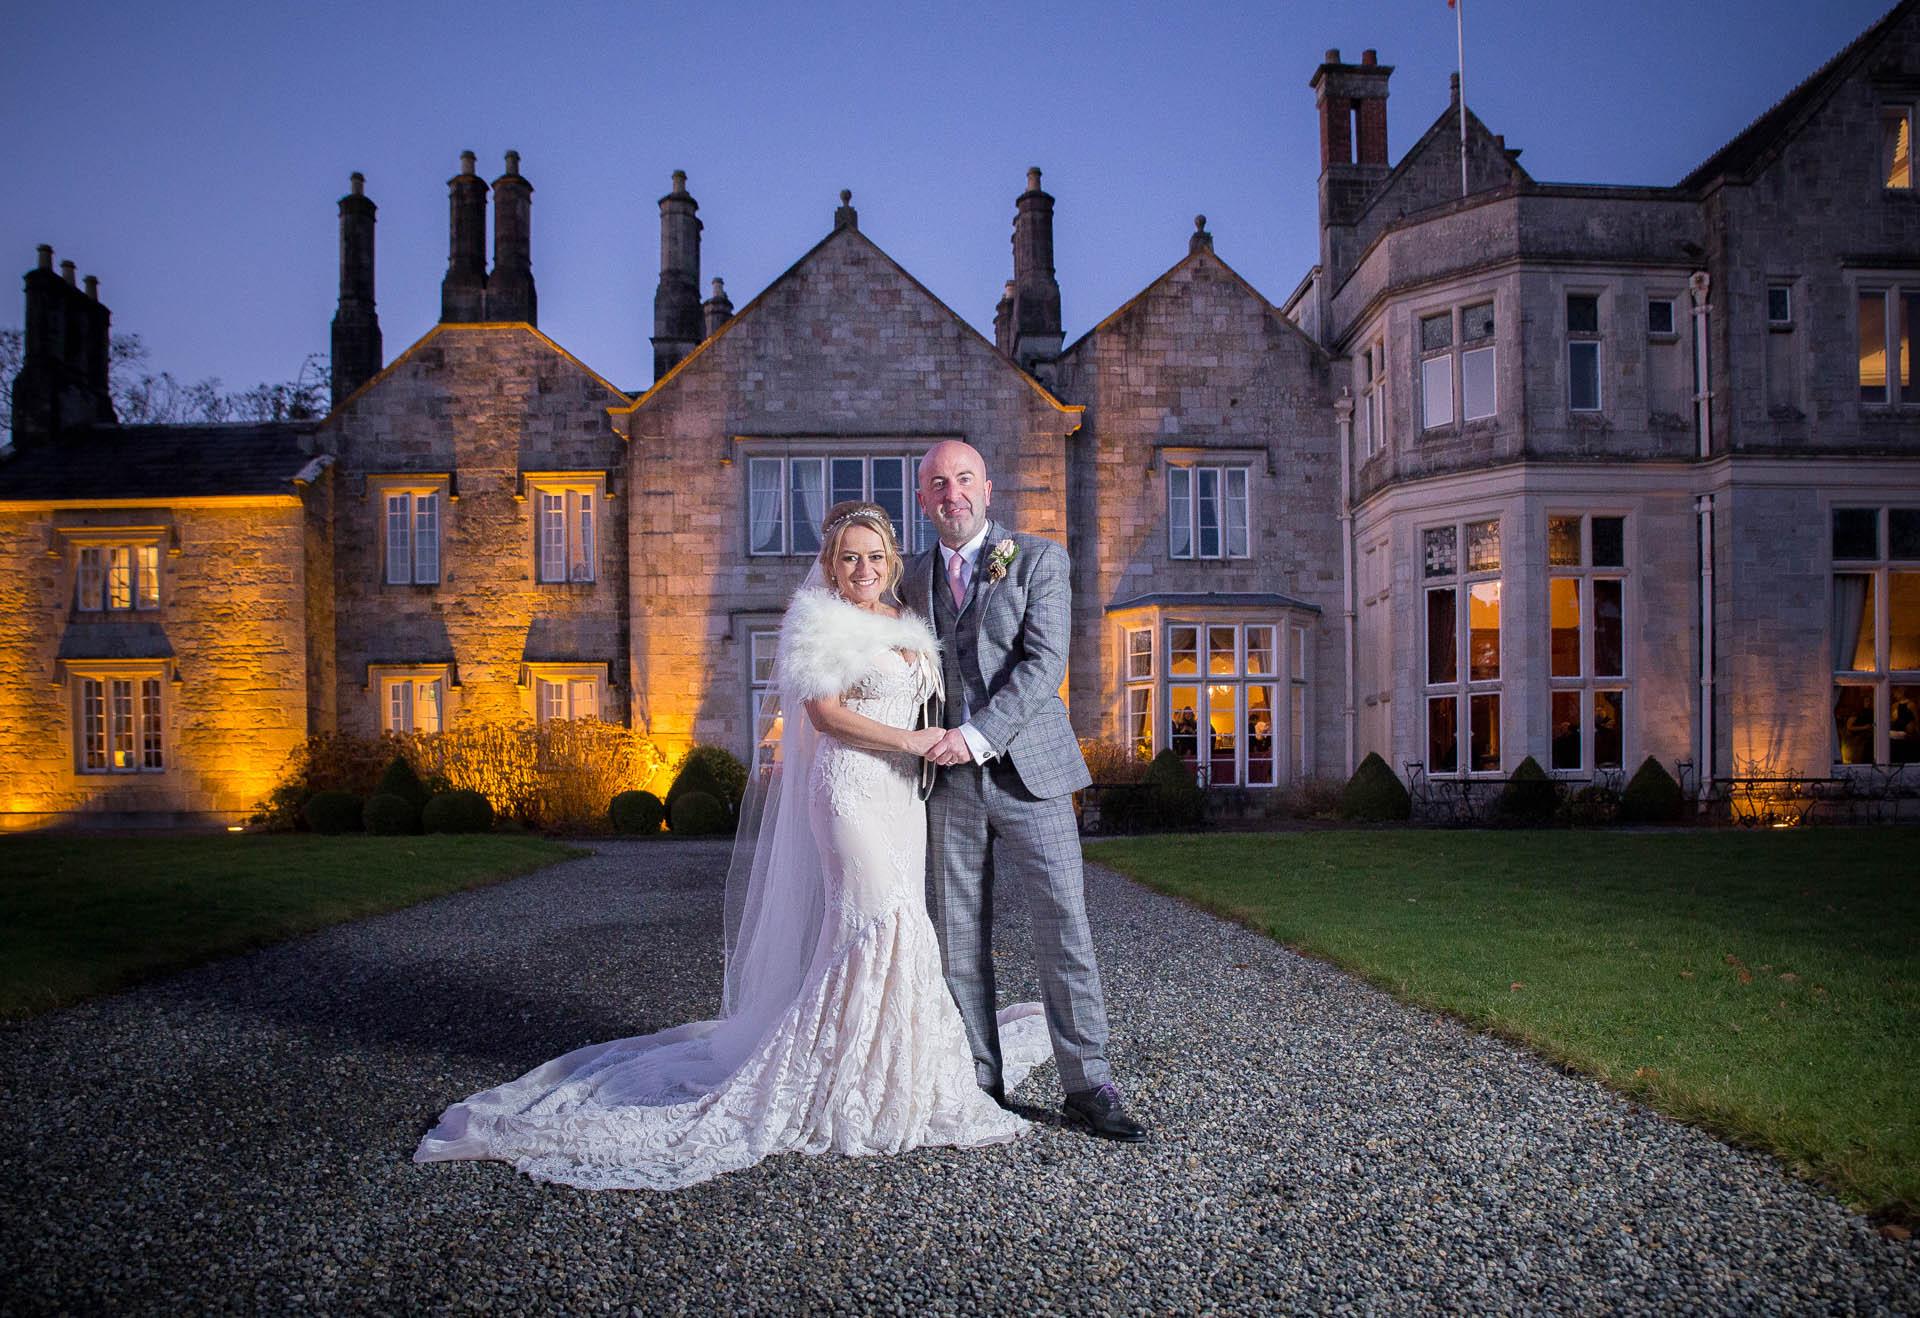 Ailish & Dougie @ Lough Rynn Castle